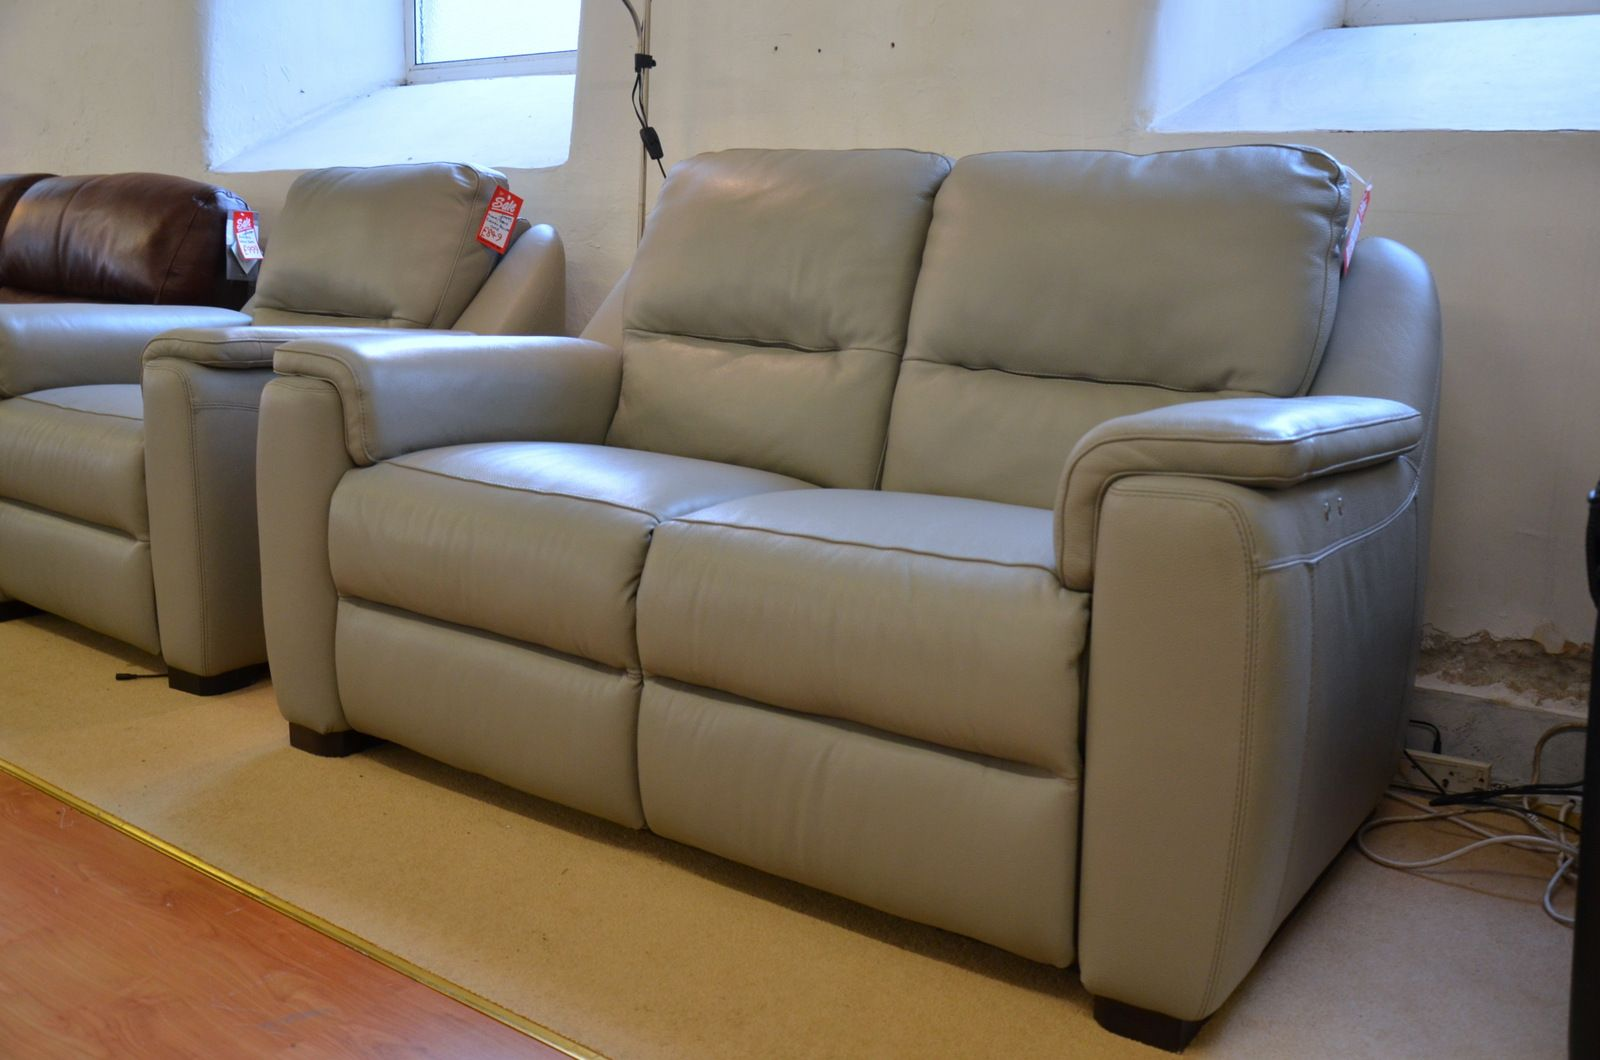 Enjoyable Strauss Grey Leather Recliner Sofa Three Piece Suite Bralicious Painted Fabric Chair Ideas Braliciousco